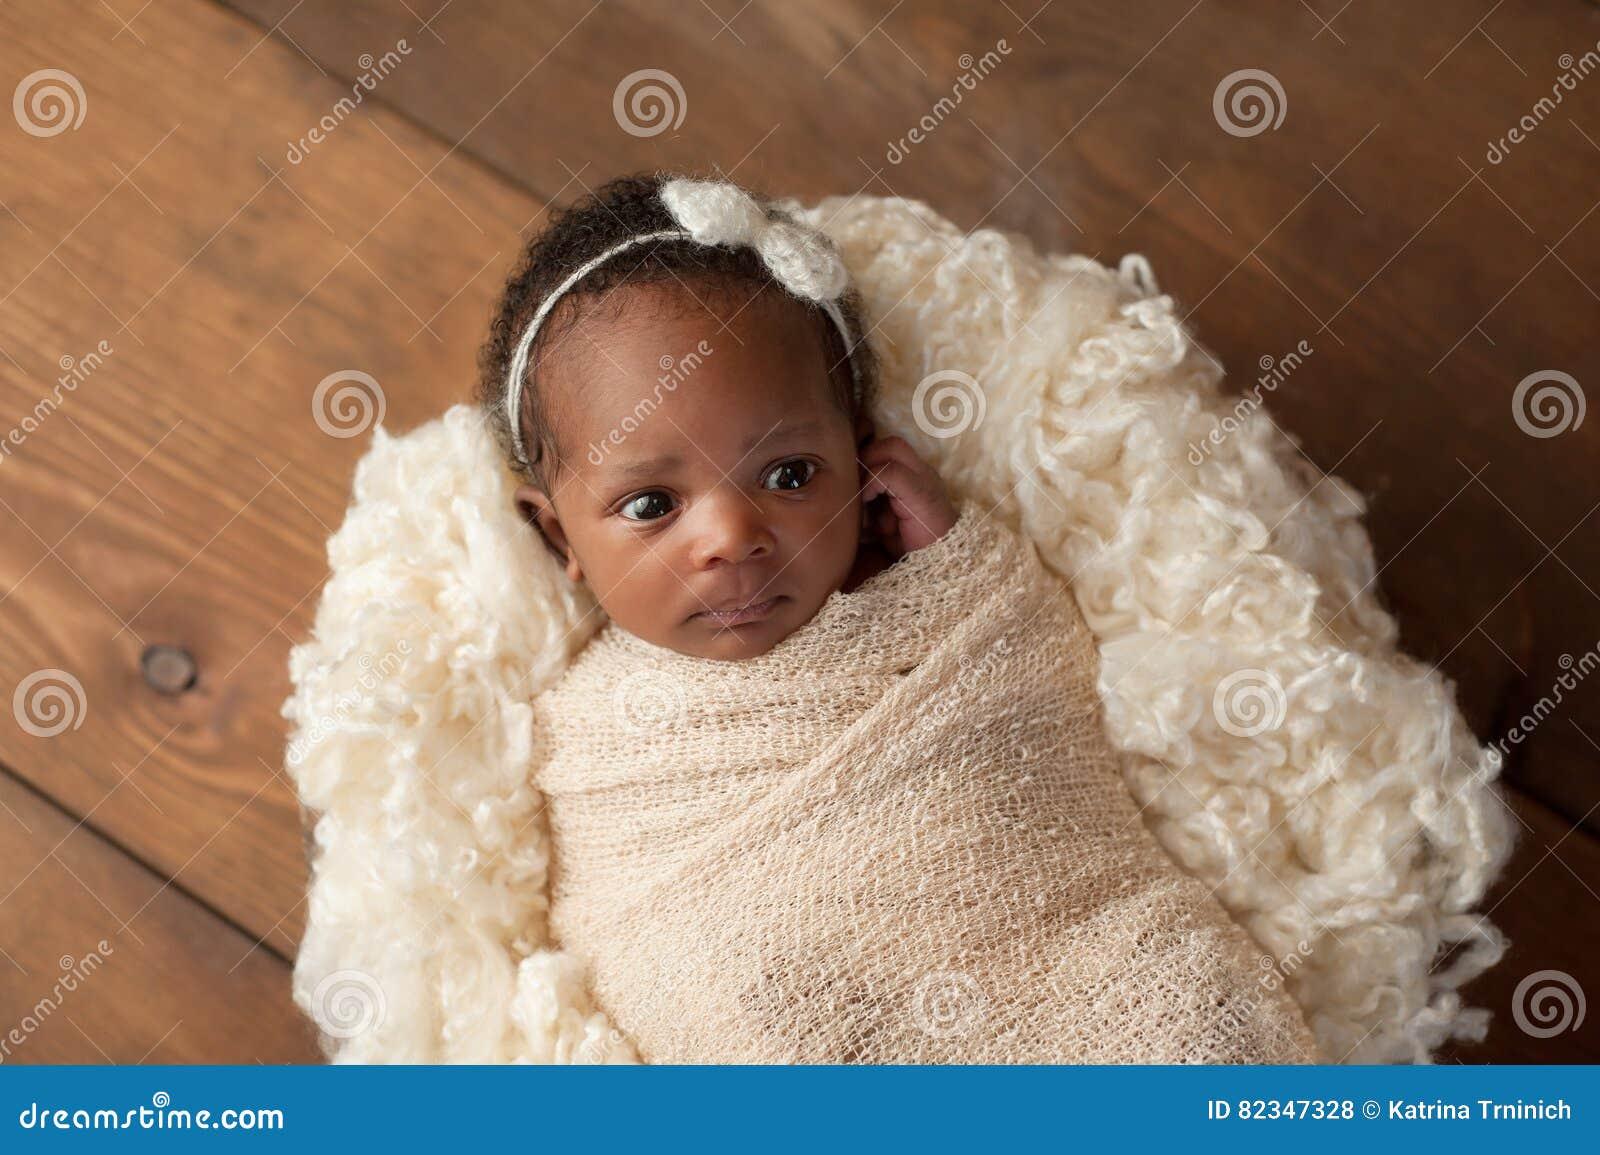 Alert Newborn Baby Girl Swaddled in a Stretch Wrap